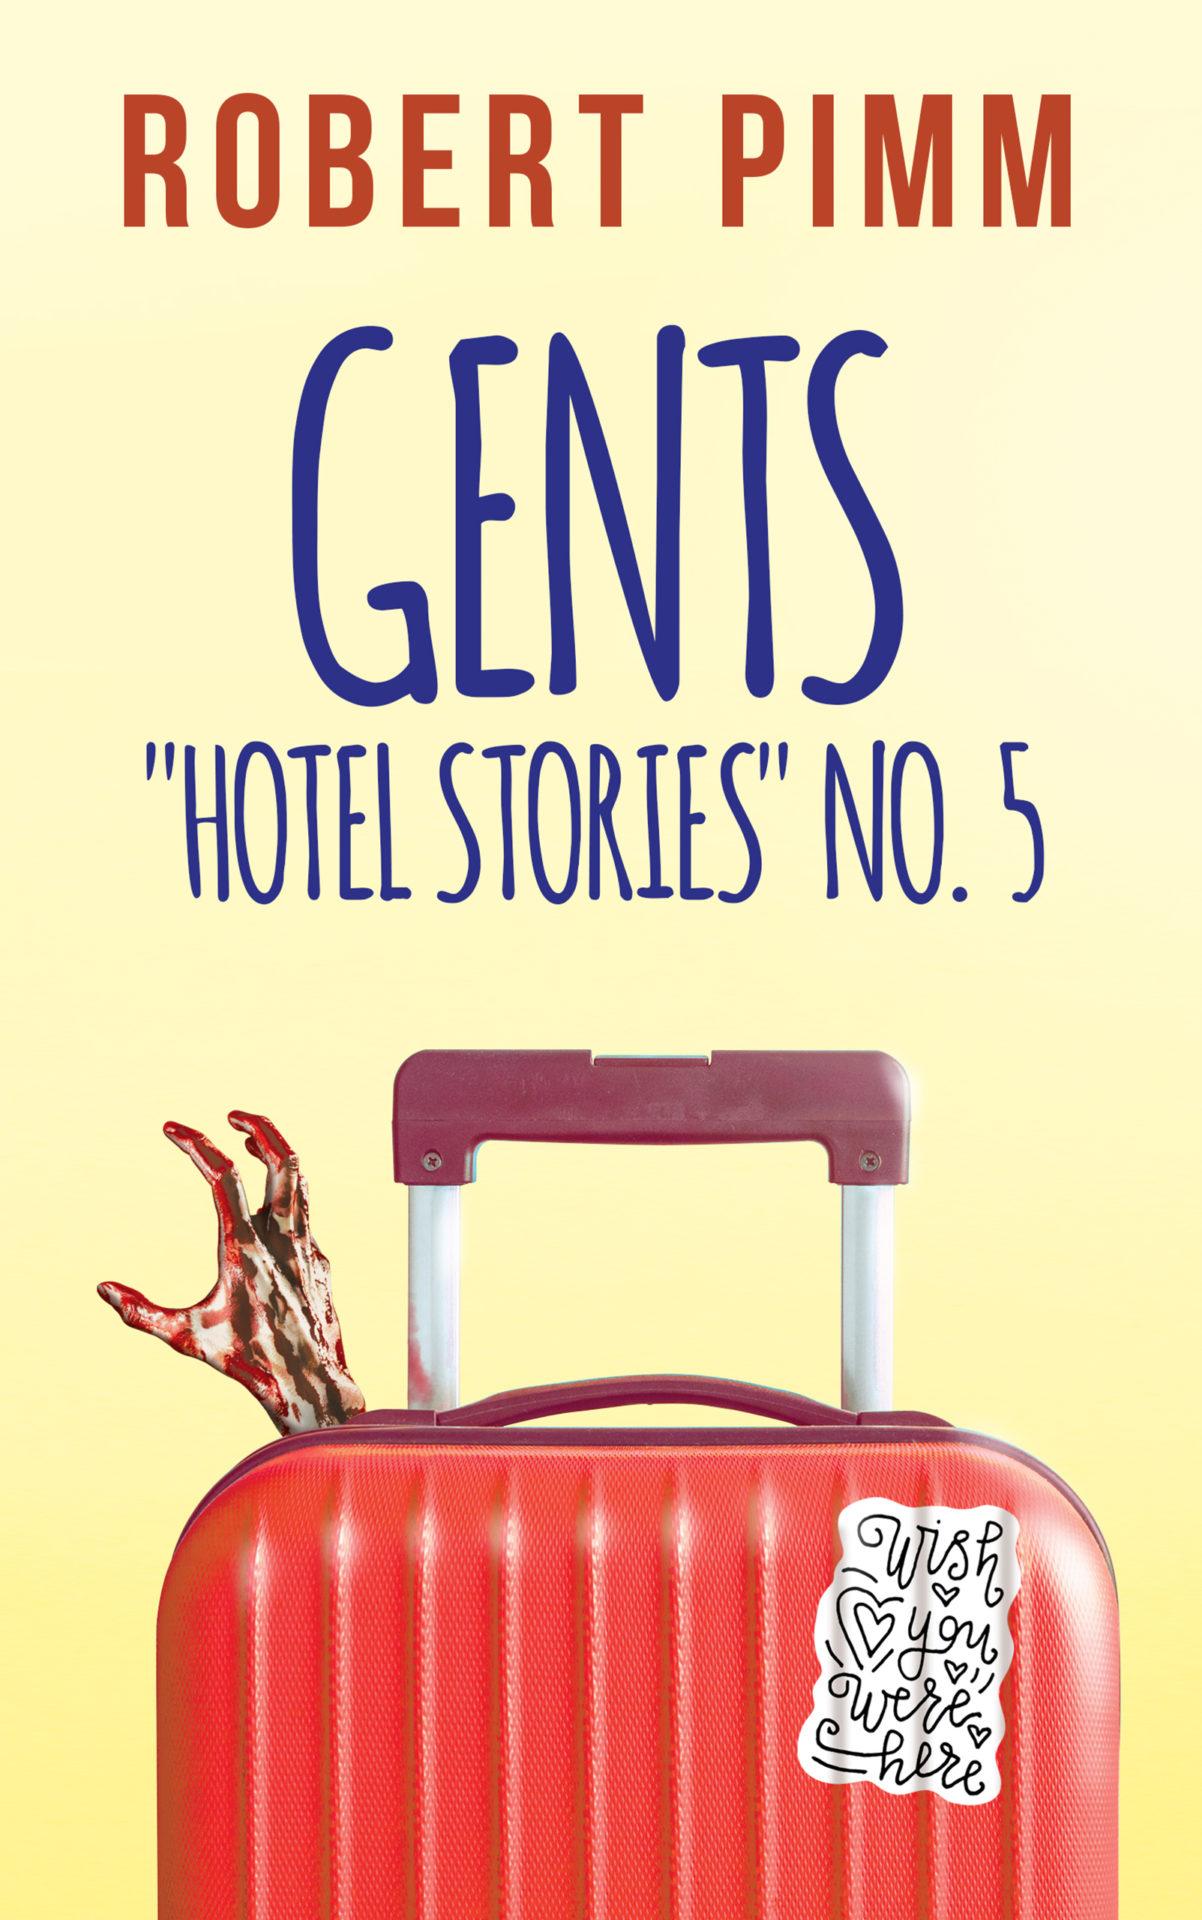 Gents: a story about alligators